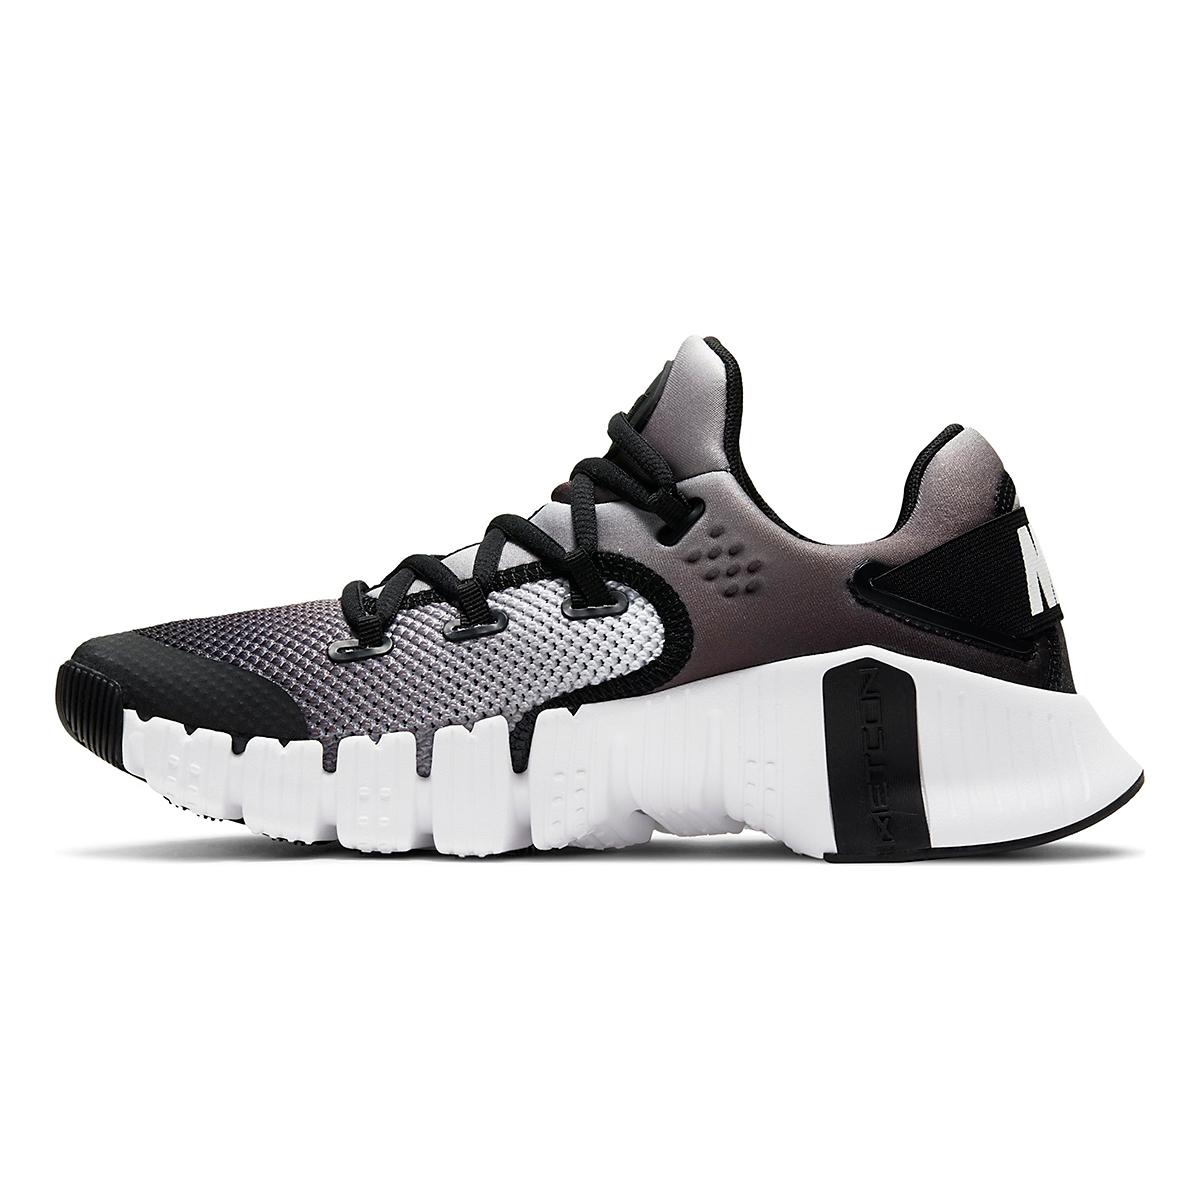 Women's Nike Free Metcon 4 Training Shoe - Color: White/Black - Size: 5 - Width: Regular, White/Black, large, image 2